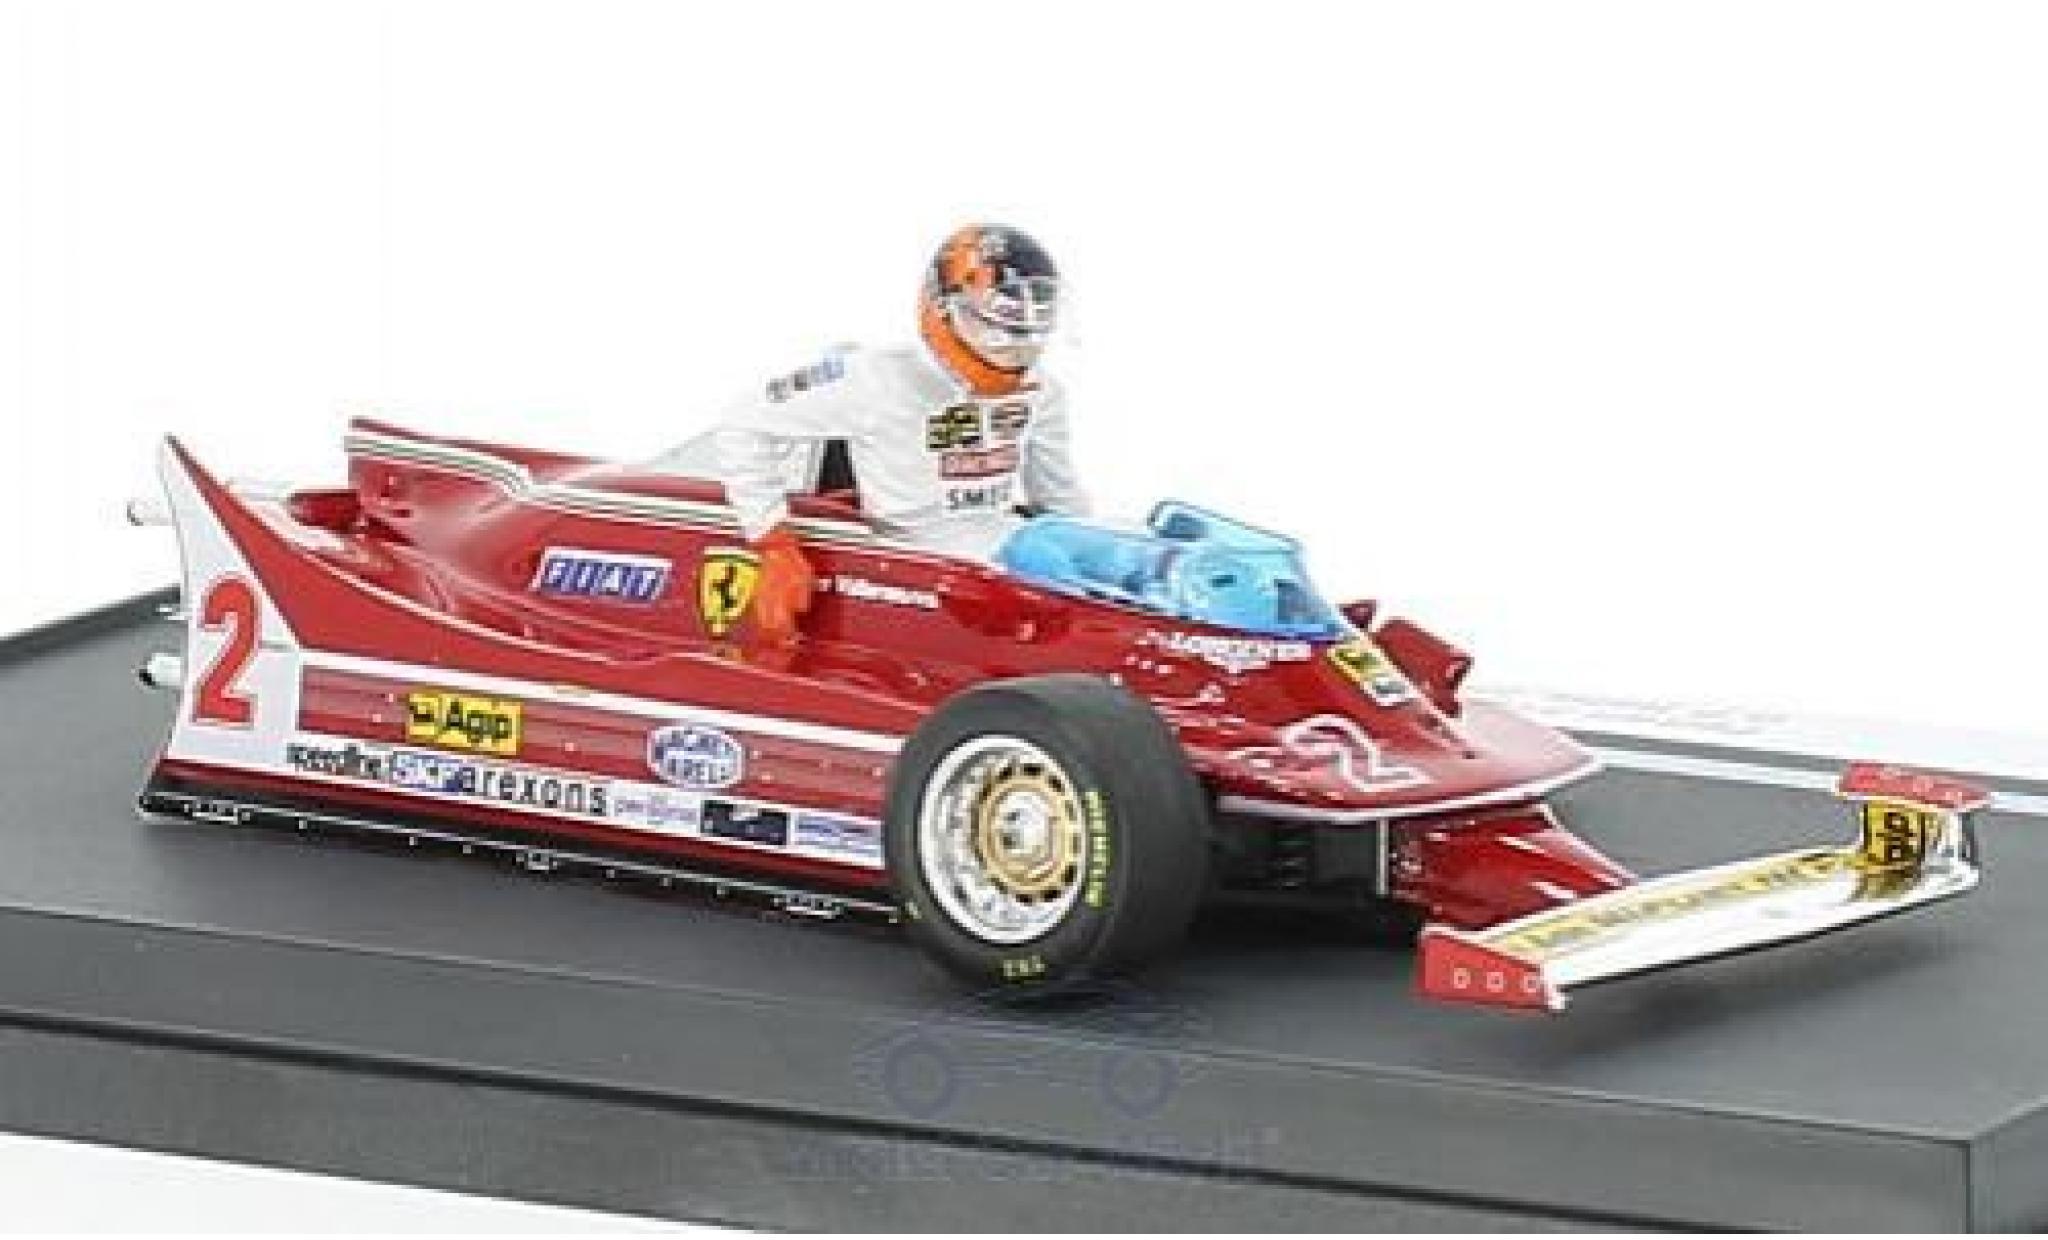 Ferrari 312 P 1/43 Brumm T5 No.2 Formel 1 GP Italien 1980 mit Fahrerfigur G.Villeneuve